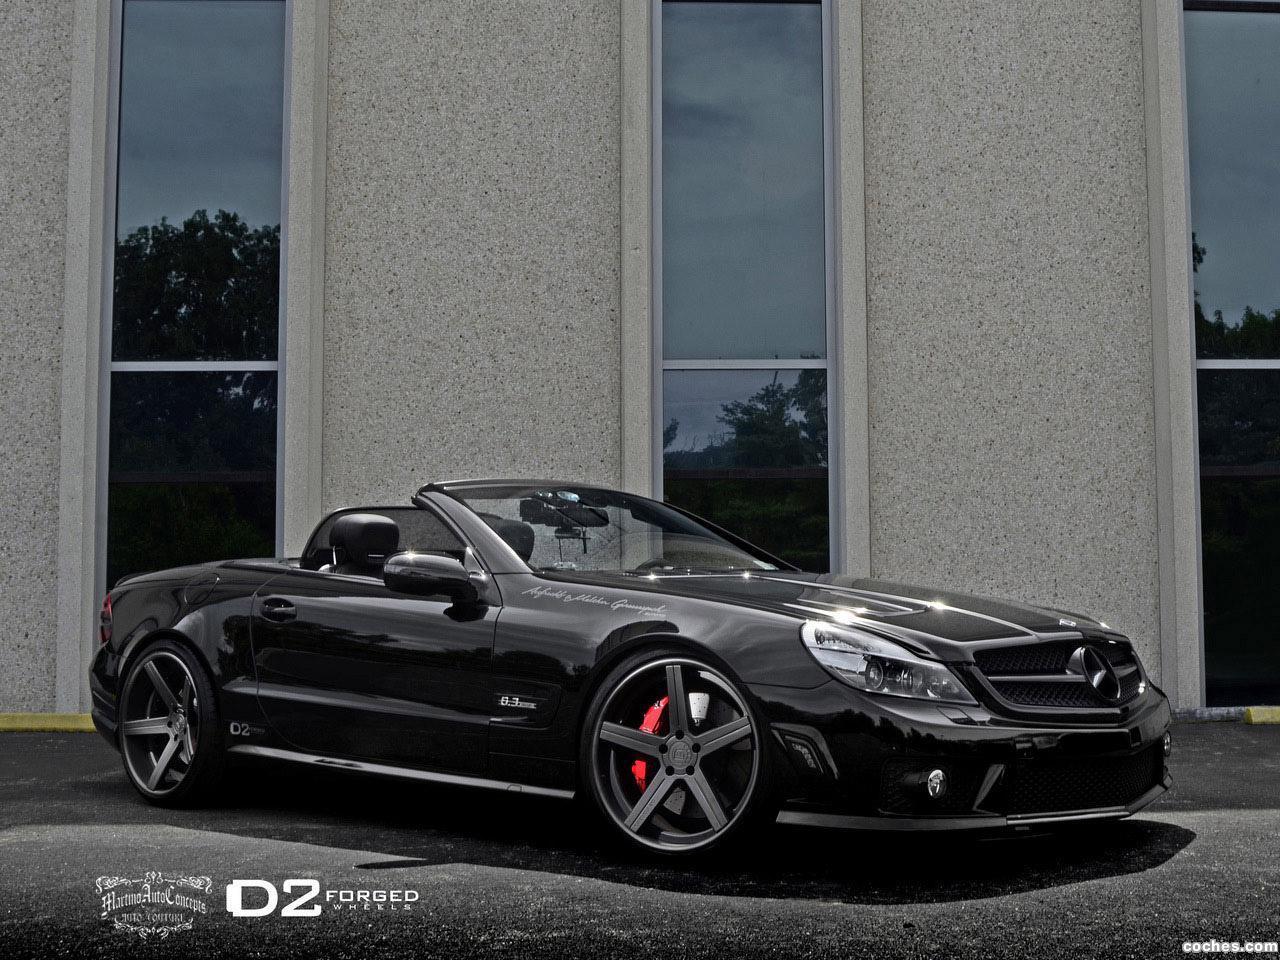 Foto 5 de Mercedes Clase SL SL63 D2Forged CV2 2013